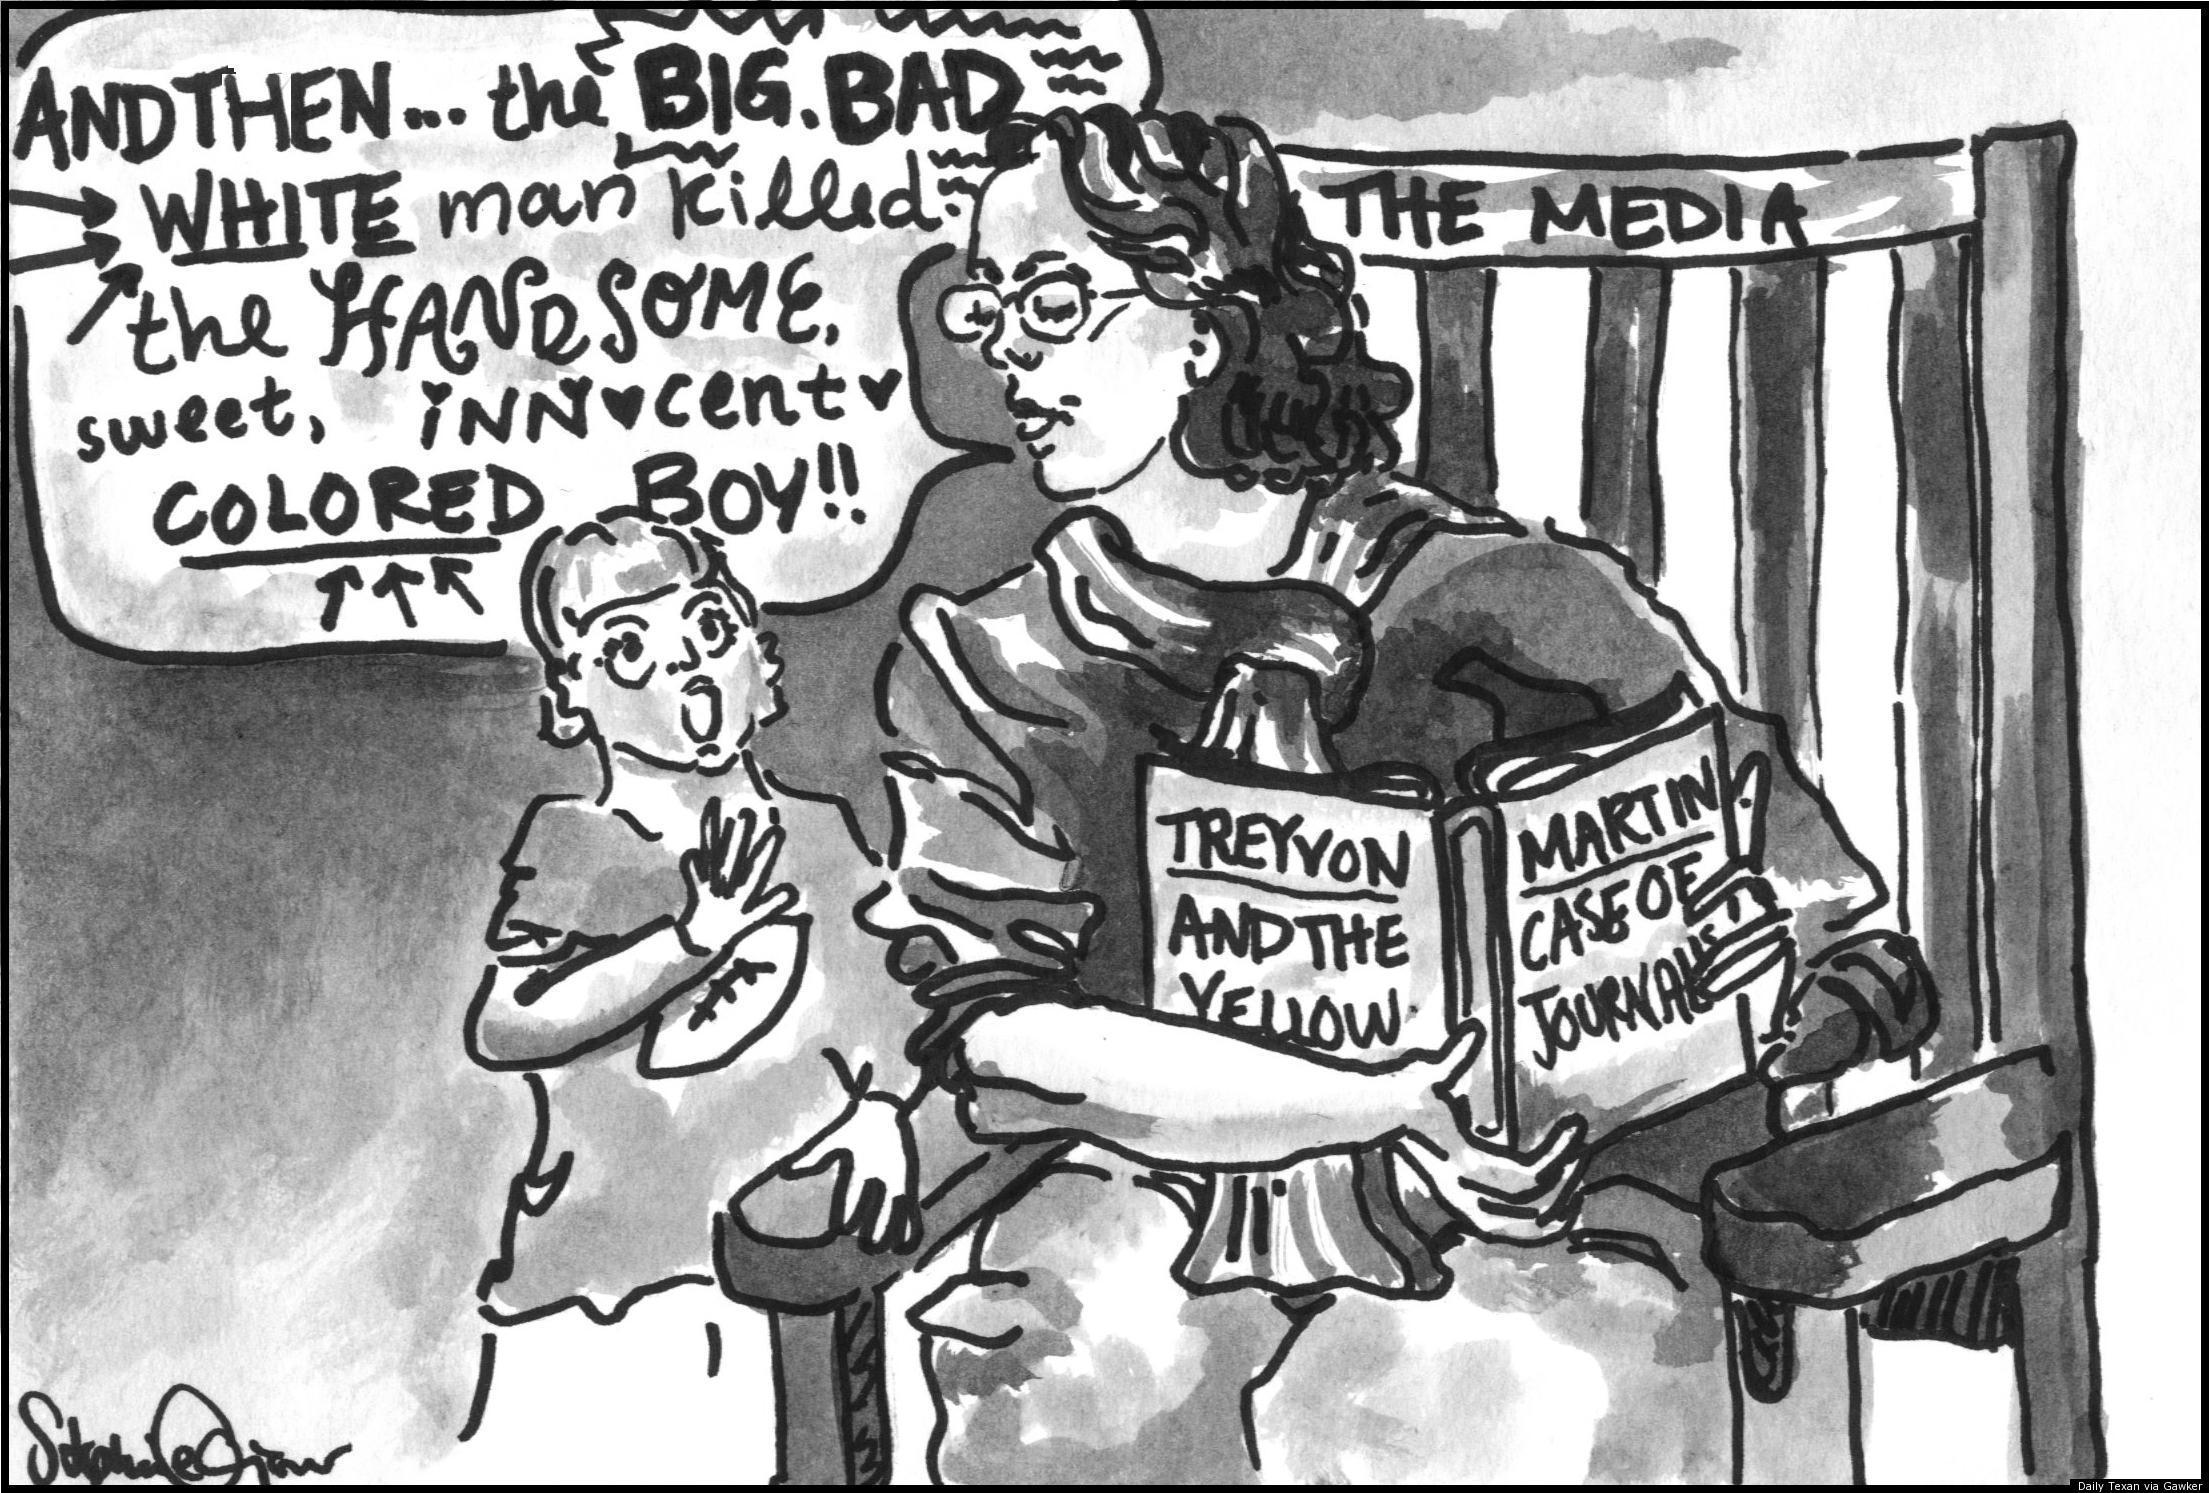 The racist comic strip